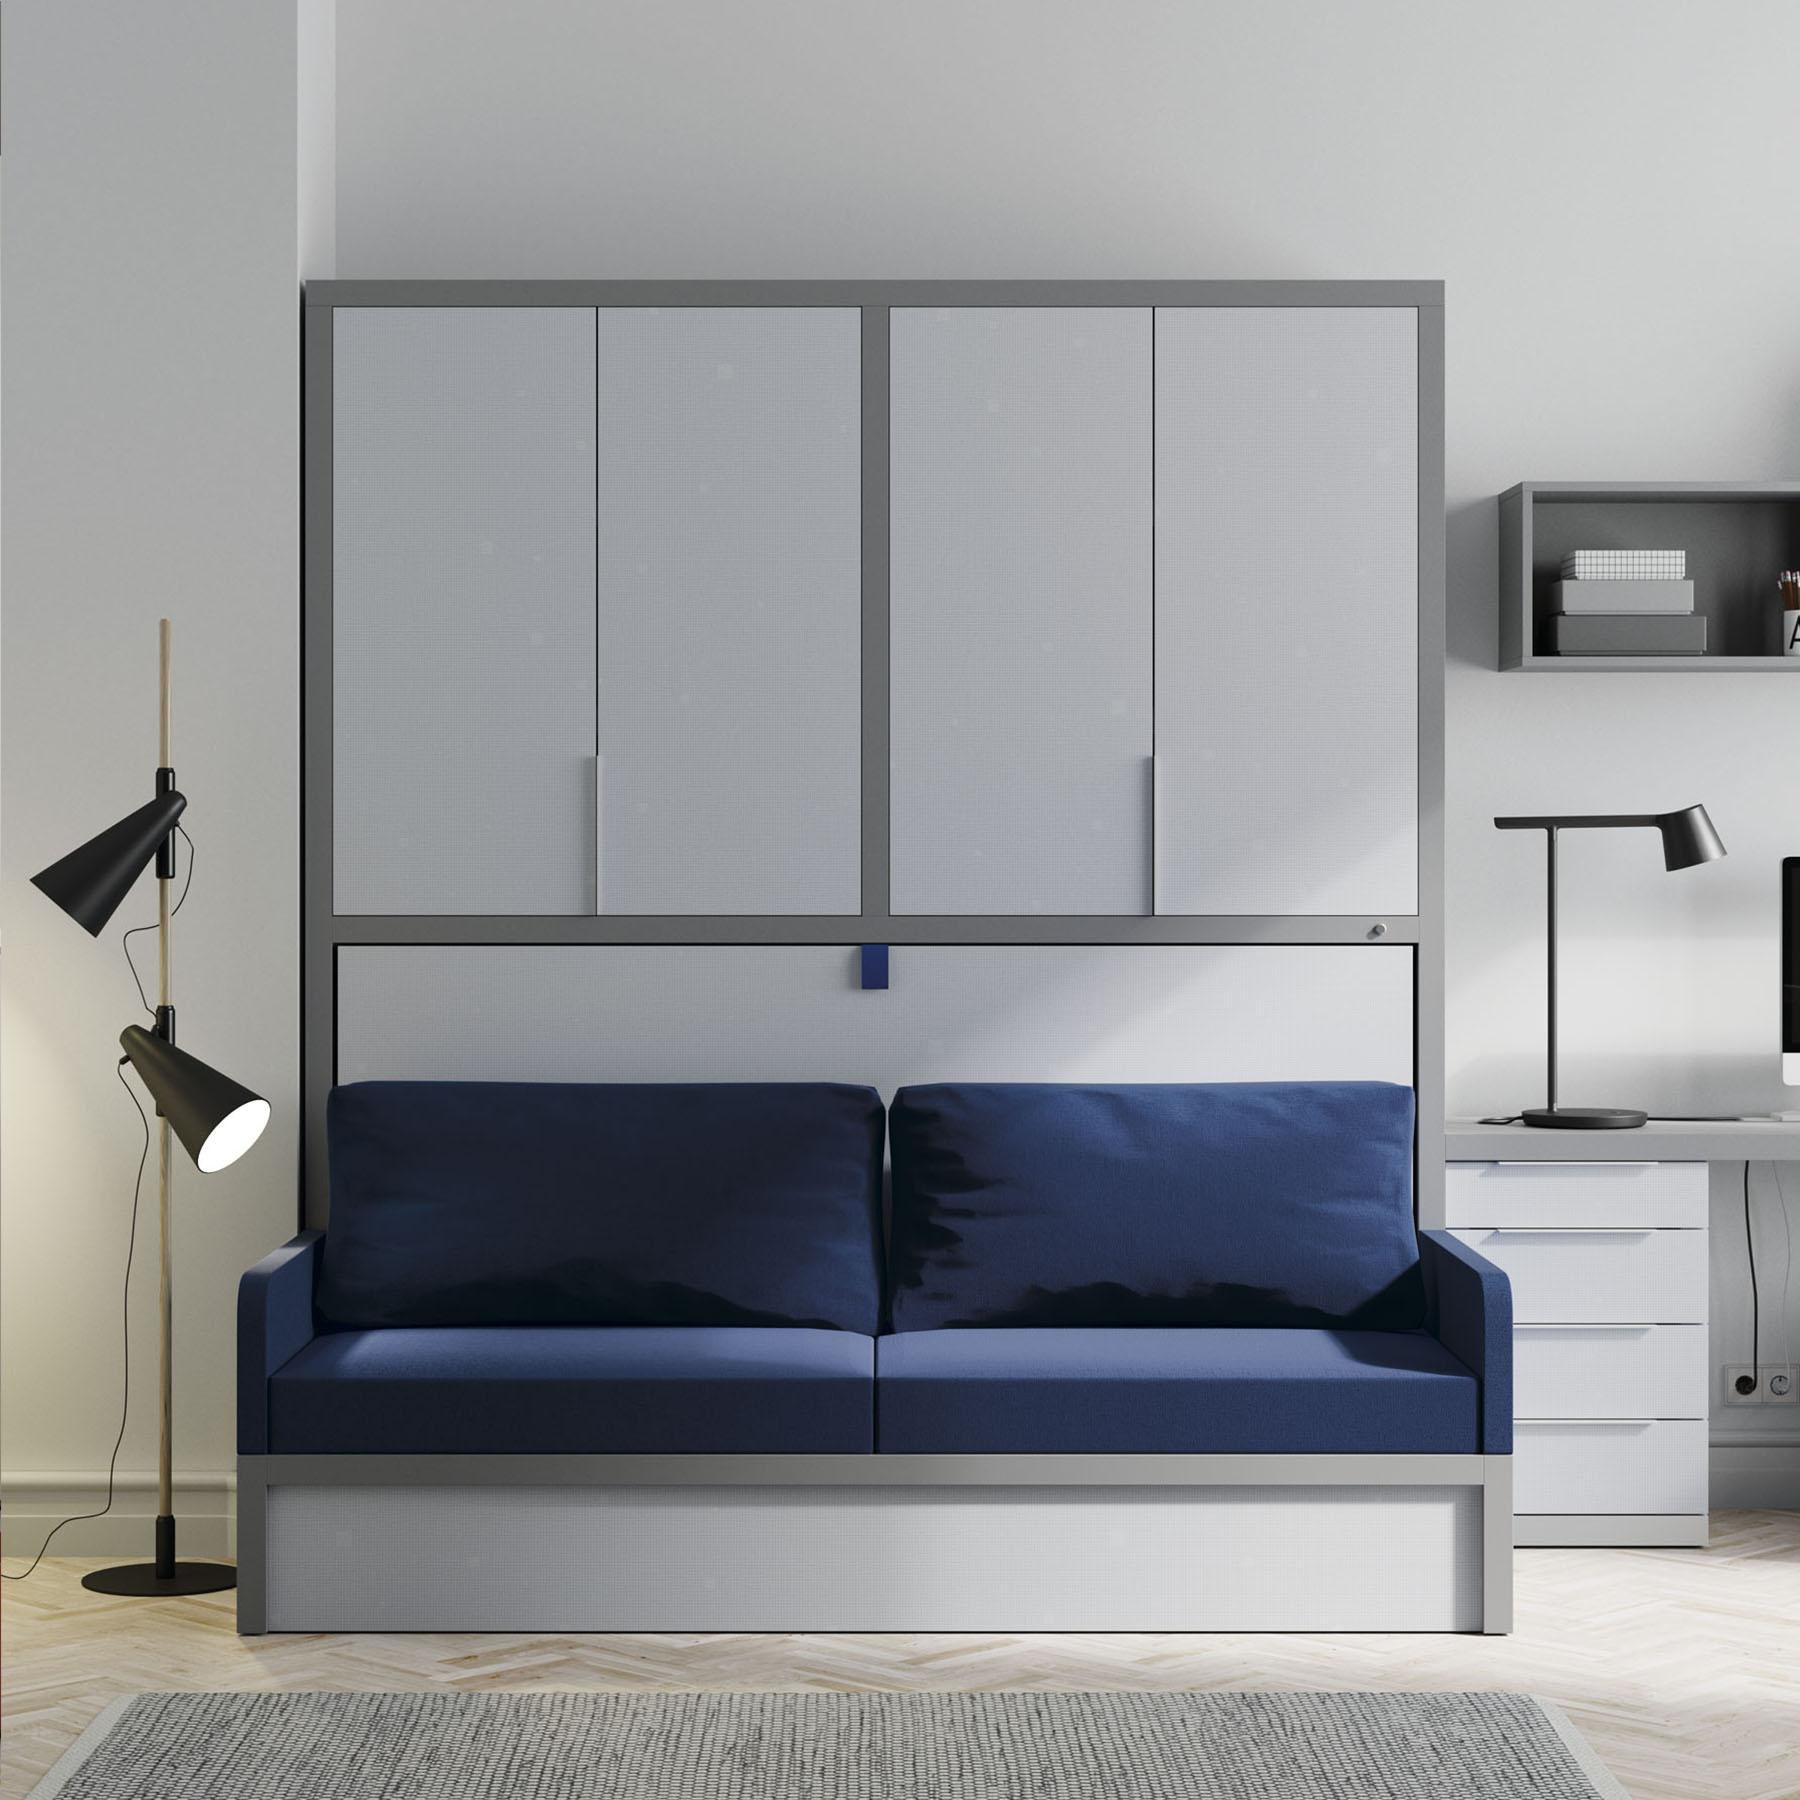 Habitaci n juvenil con cama abatible sof mbit - Sofa cama juvenil ...